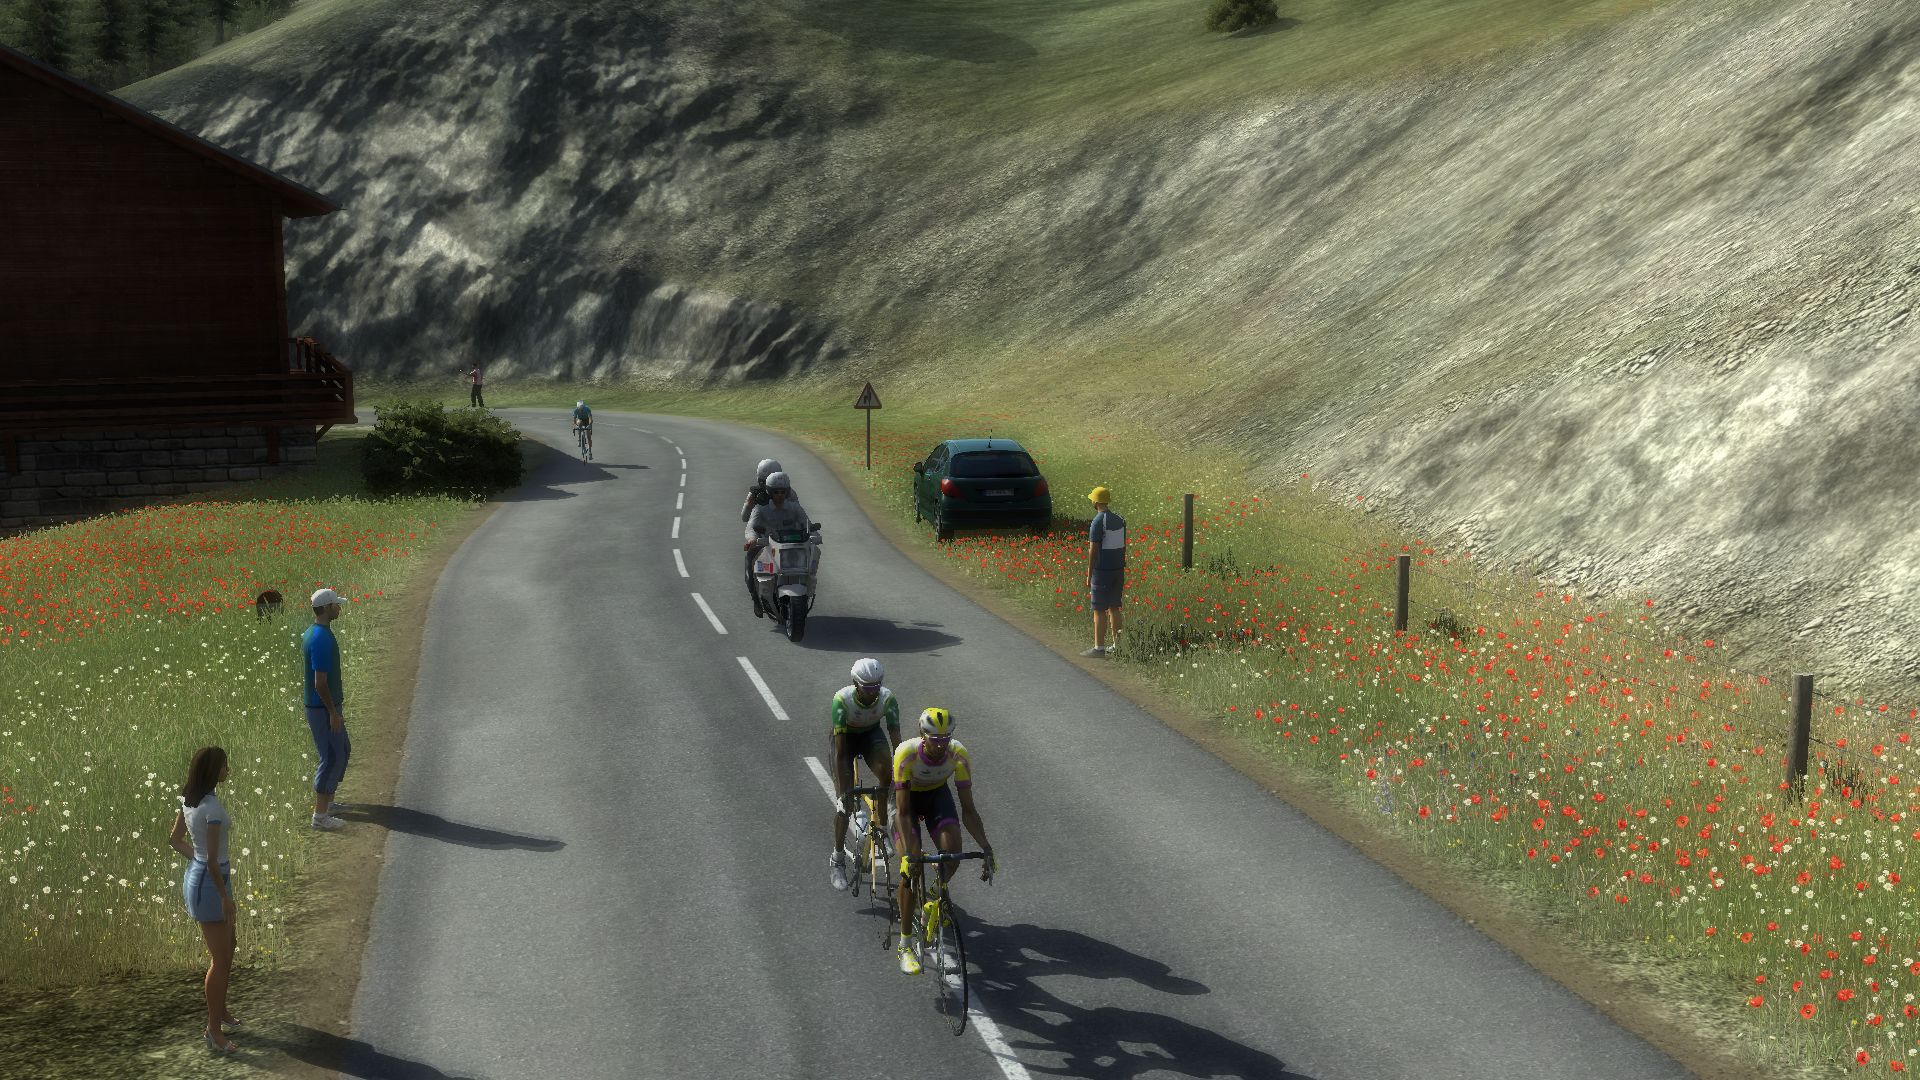 pcmdaily.com/images/mg/2017/Races/U23/Avenir/AVES7%209.jpg